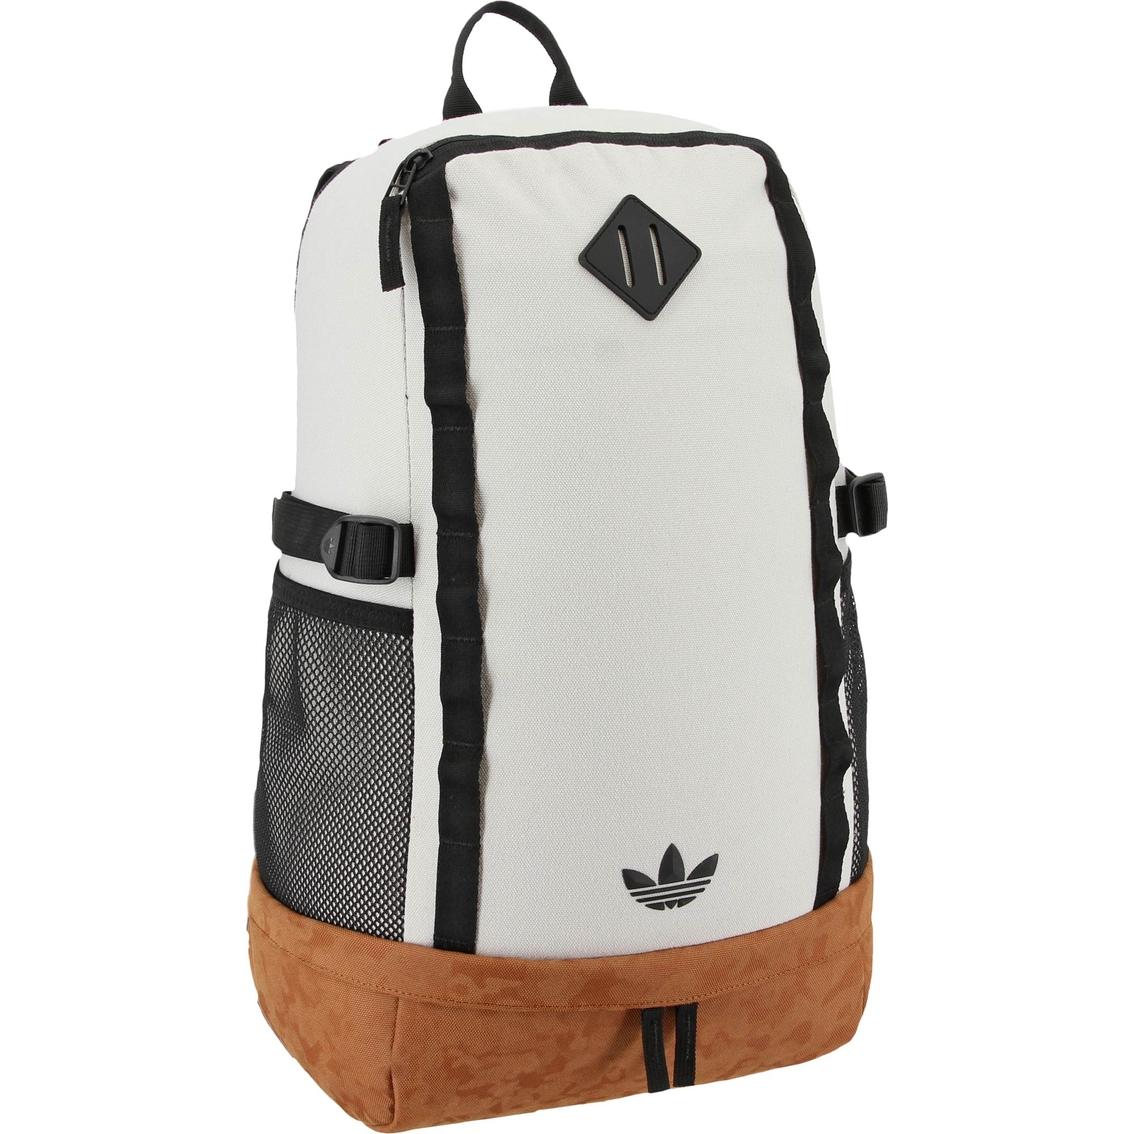 e2a0c7bf4c3 Adidas Originals Create Ii Backpack   Backpacks   More   Shop The ...